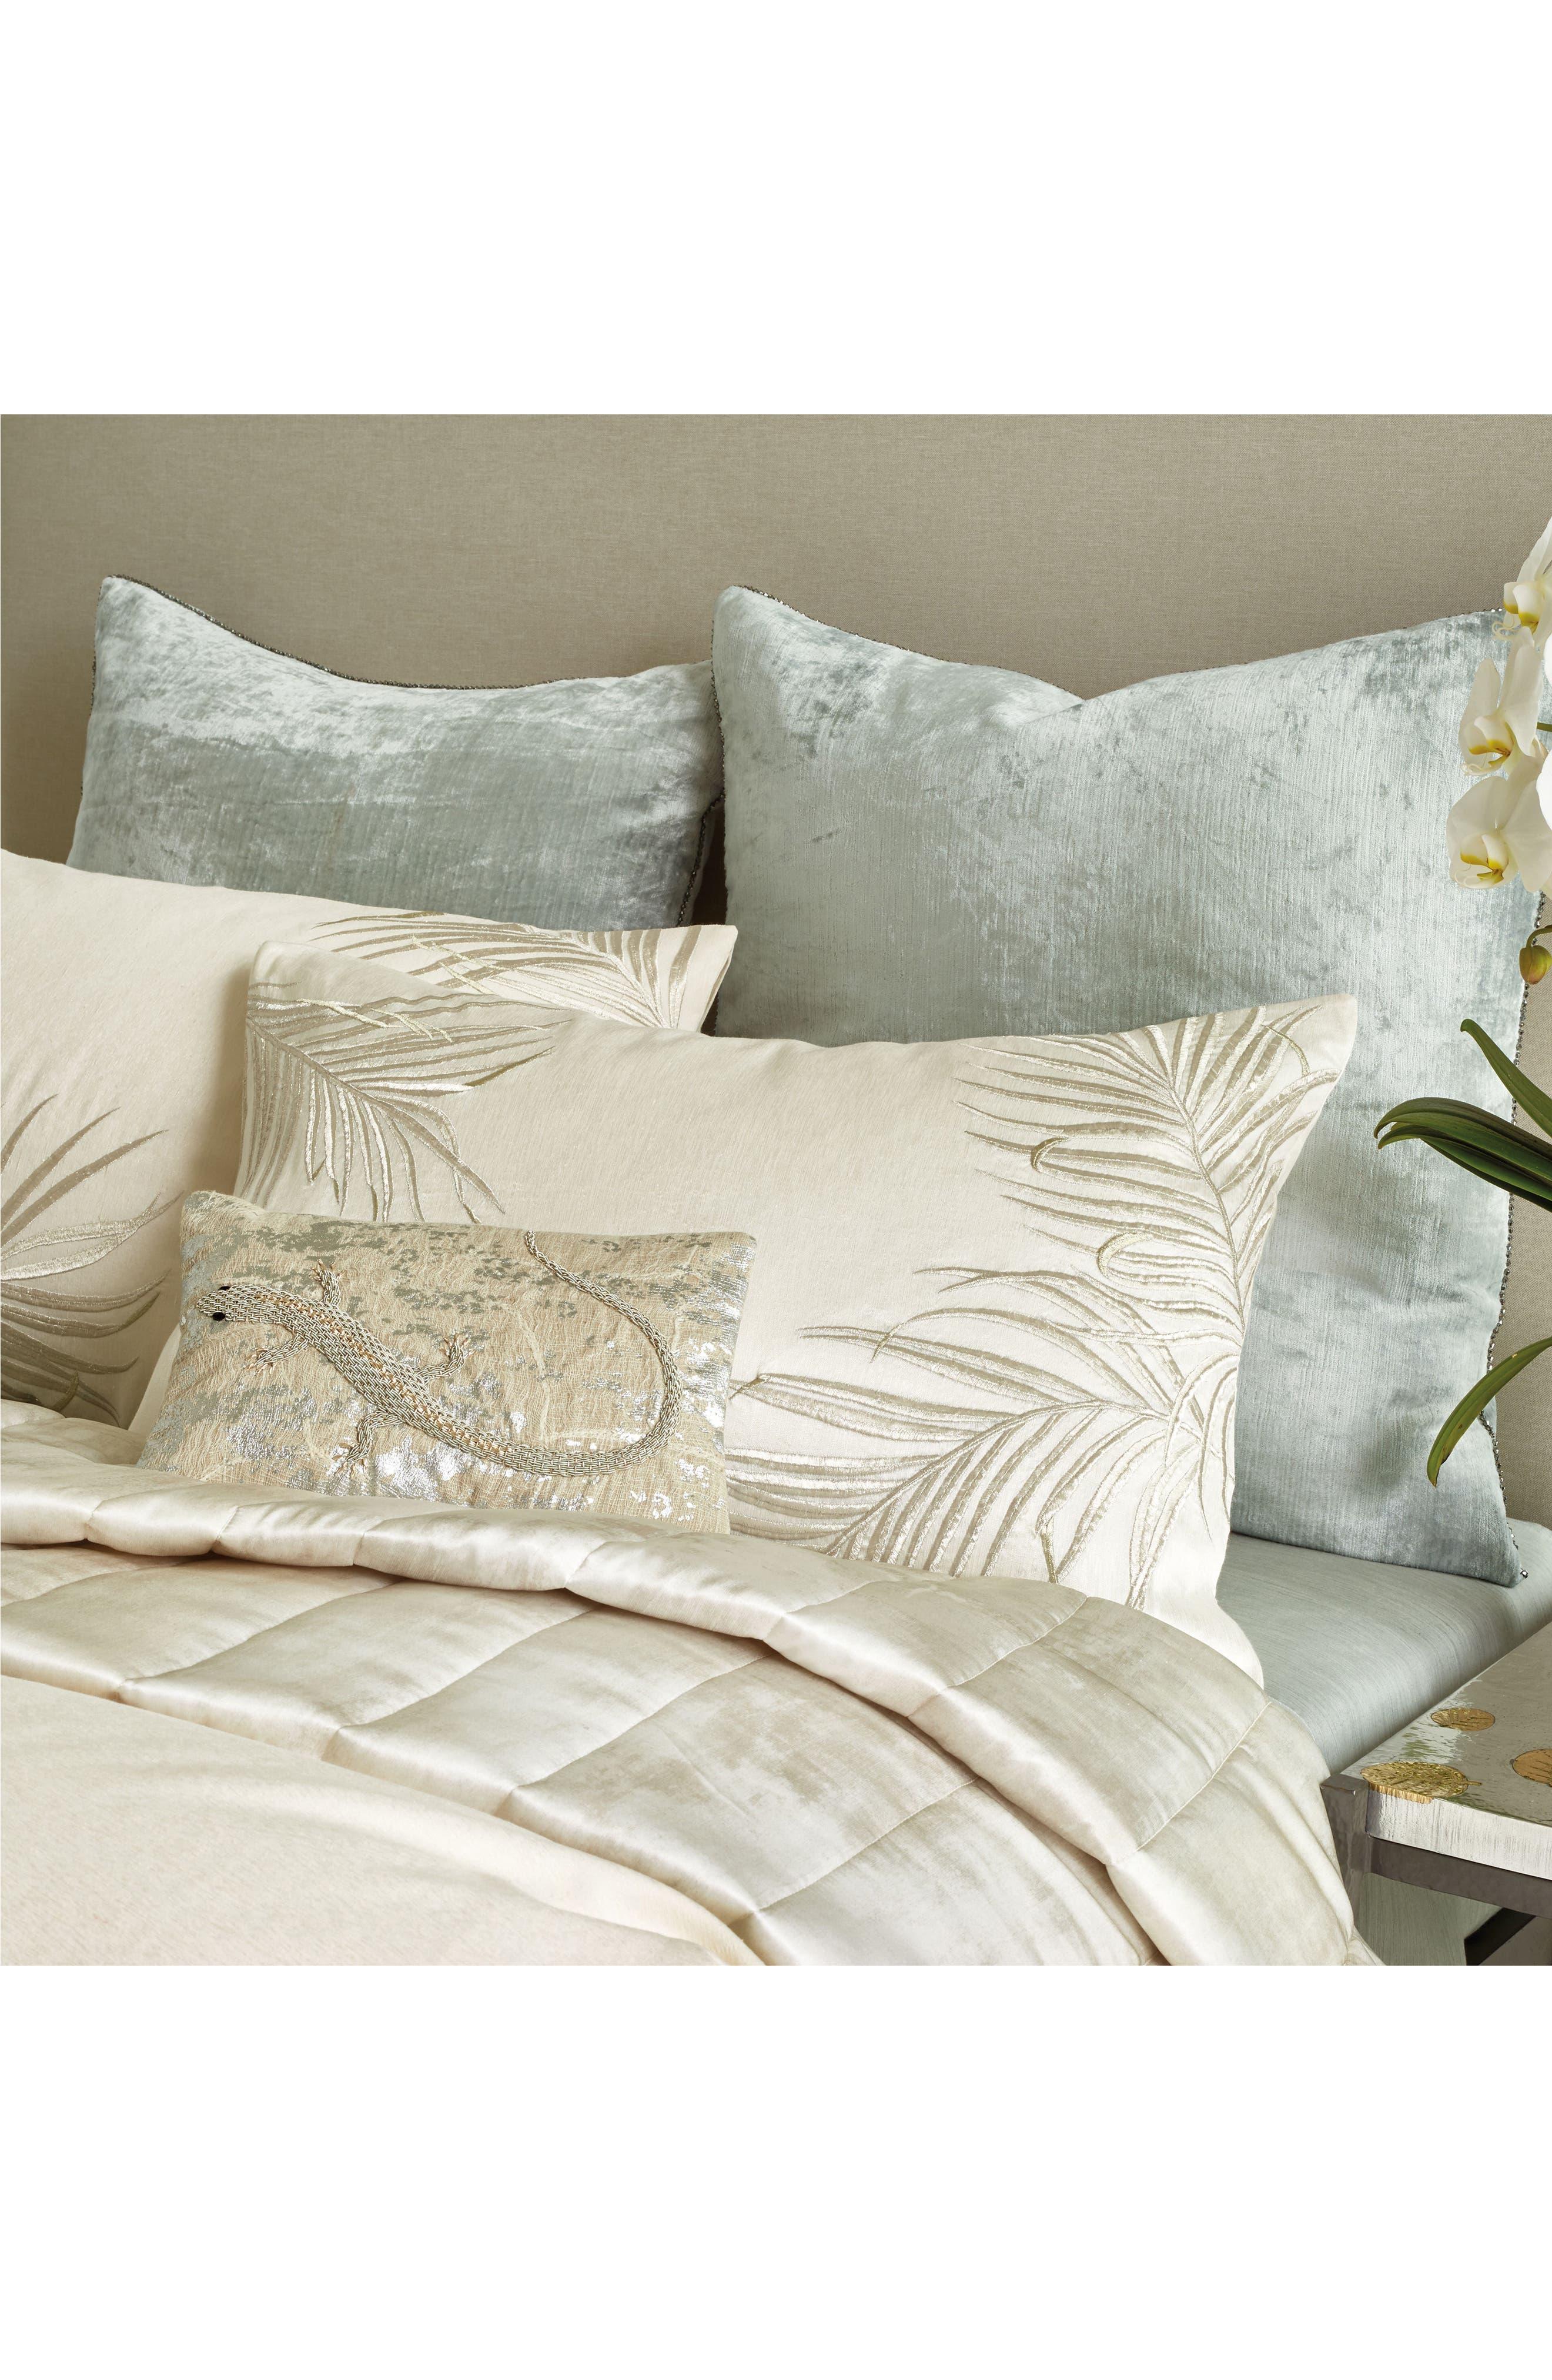 MICHAEL ARAM,                             Lizard Embroidered Decorative Pillow,                             Alternate thumbnail 3, color,                             SILVER